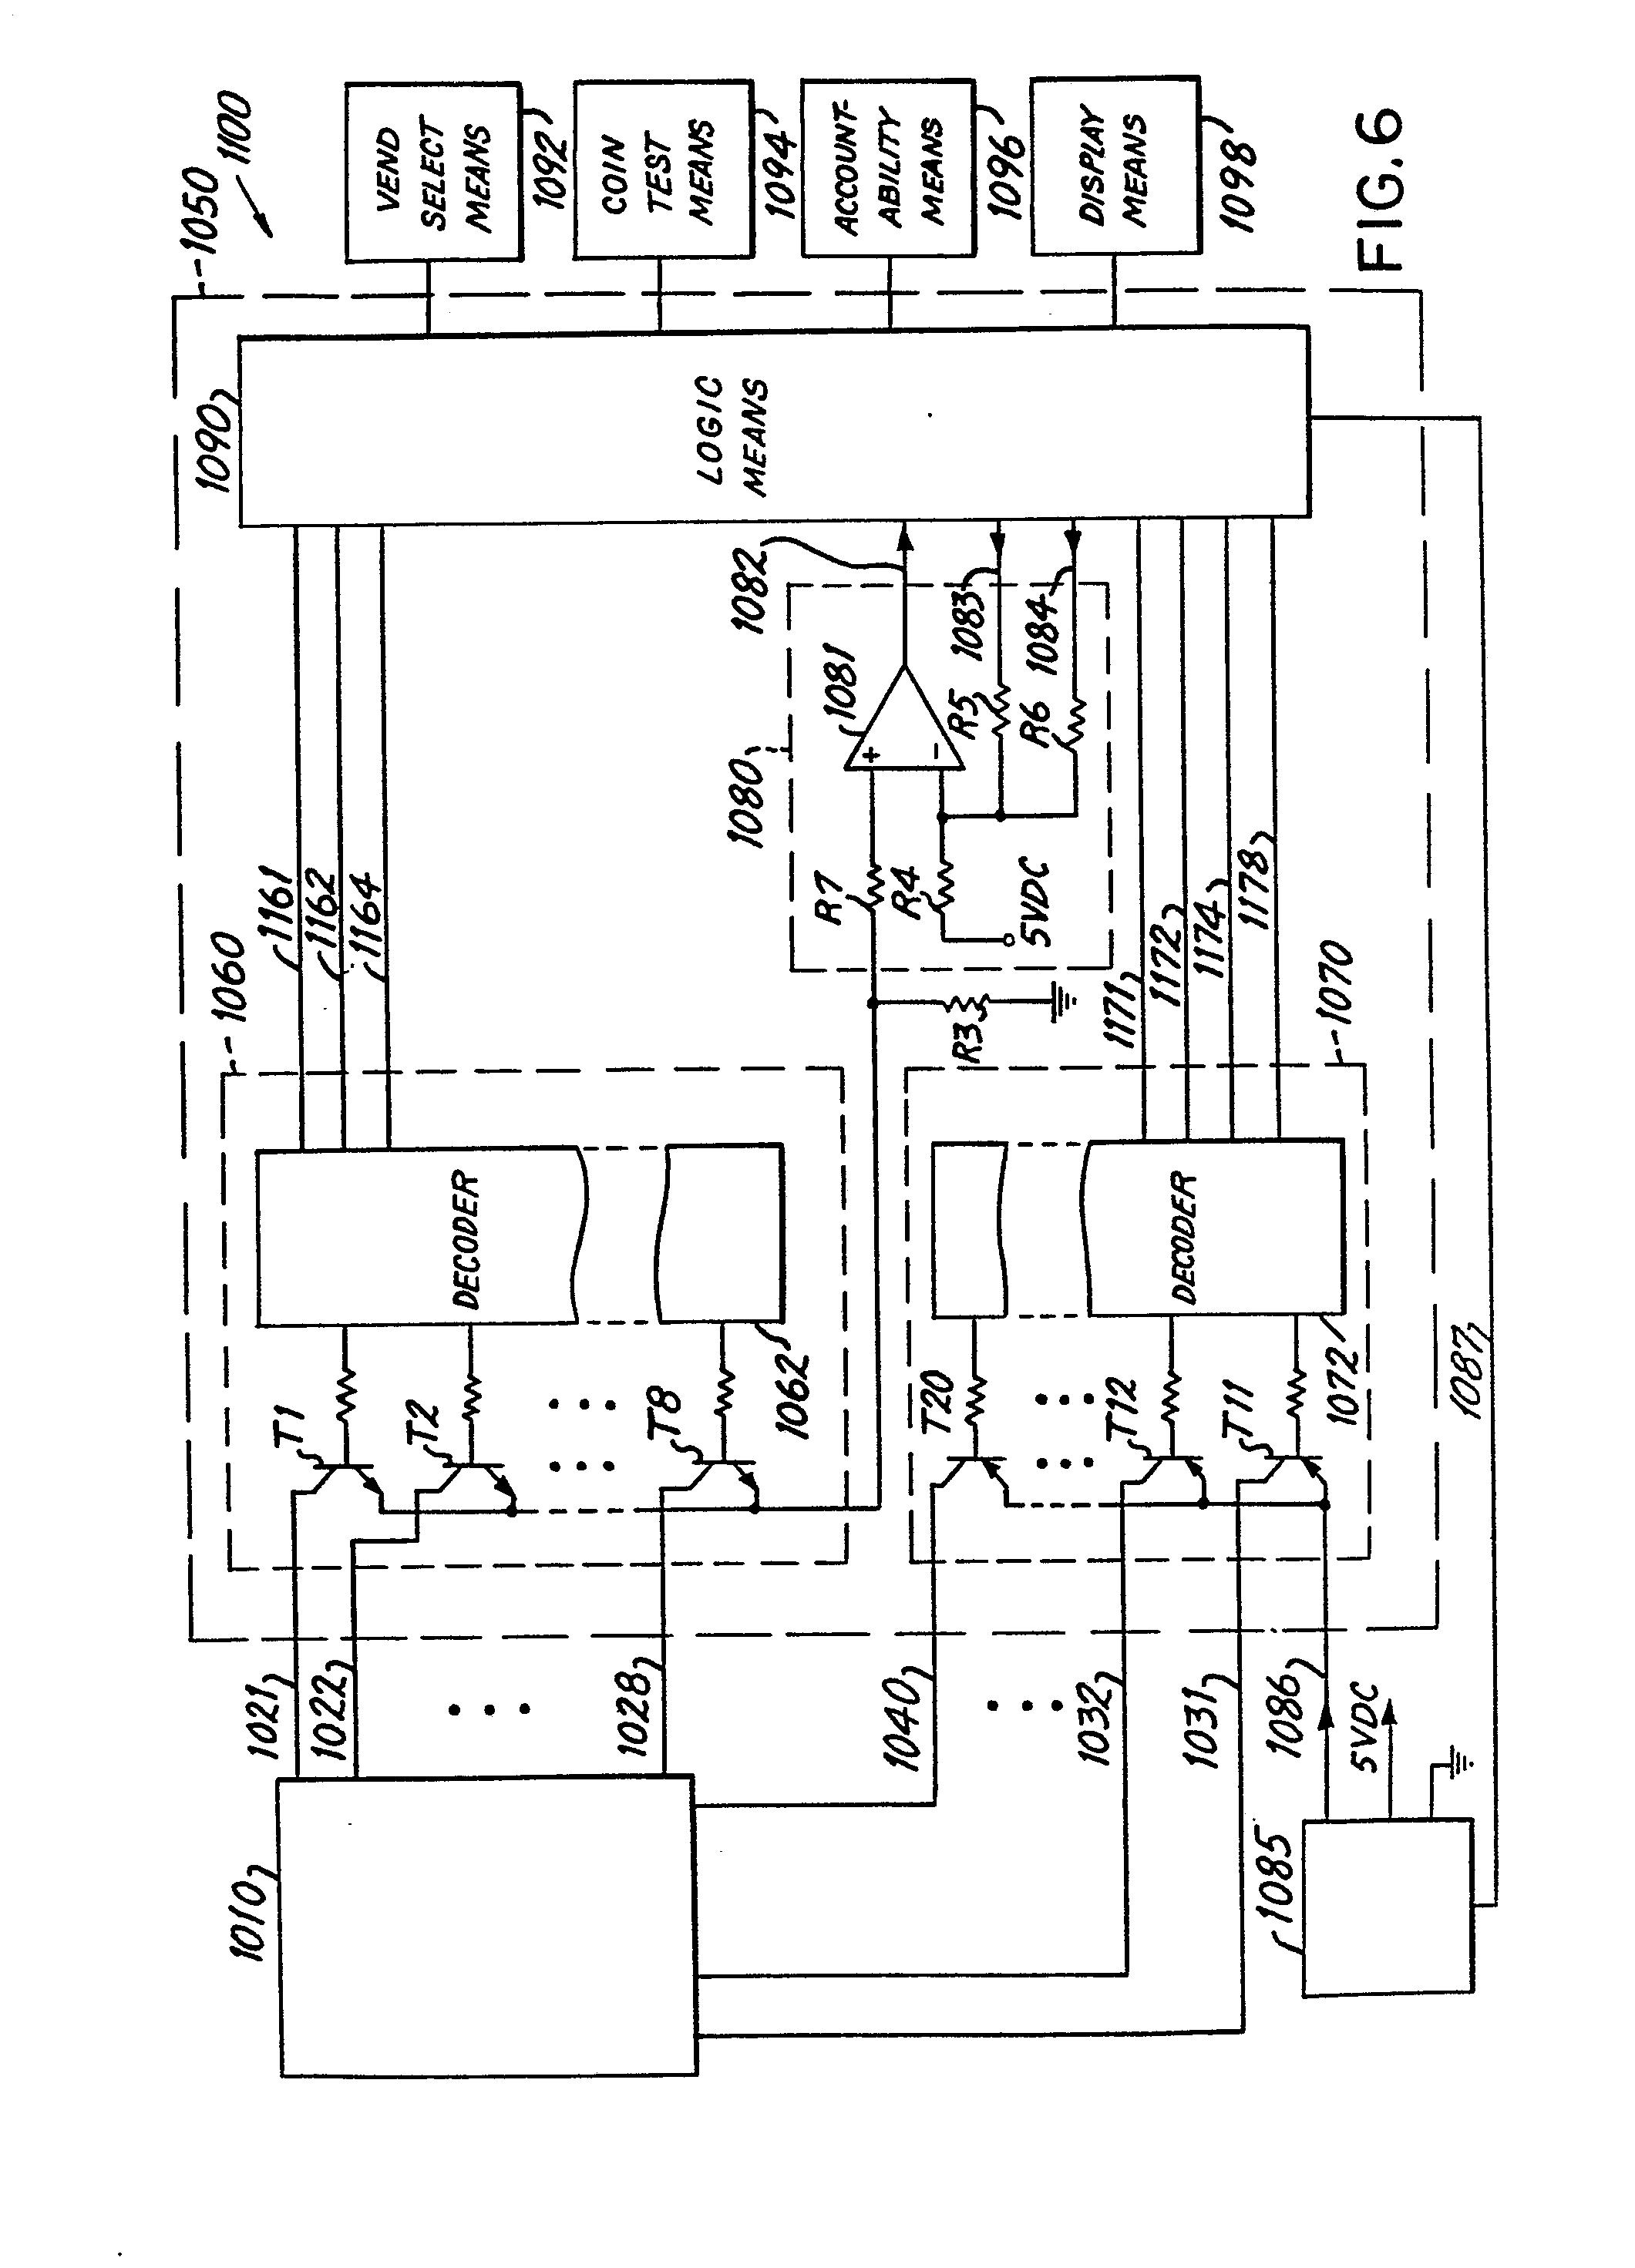 case 400 wiring diagrams gb 1613  1070 case wiring diagram wiring diagram  1070 case wiring diagram wiring diagram